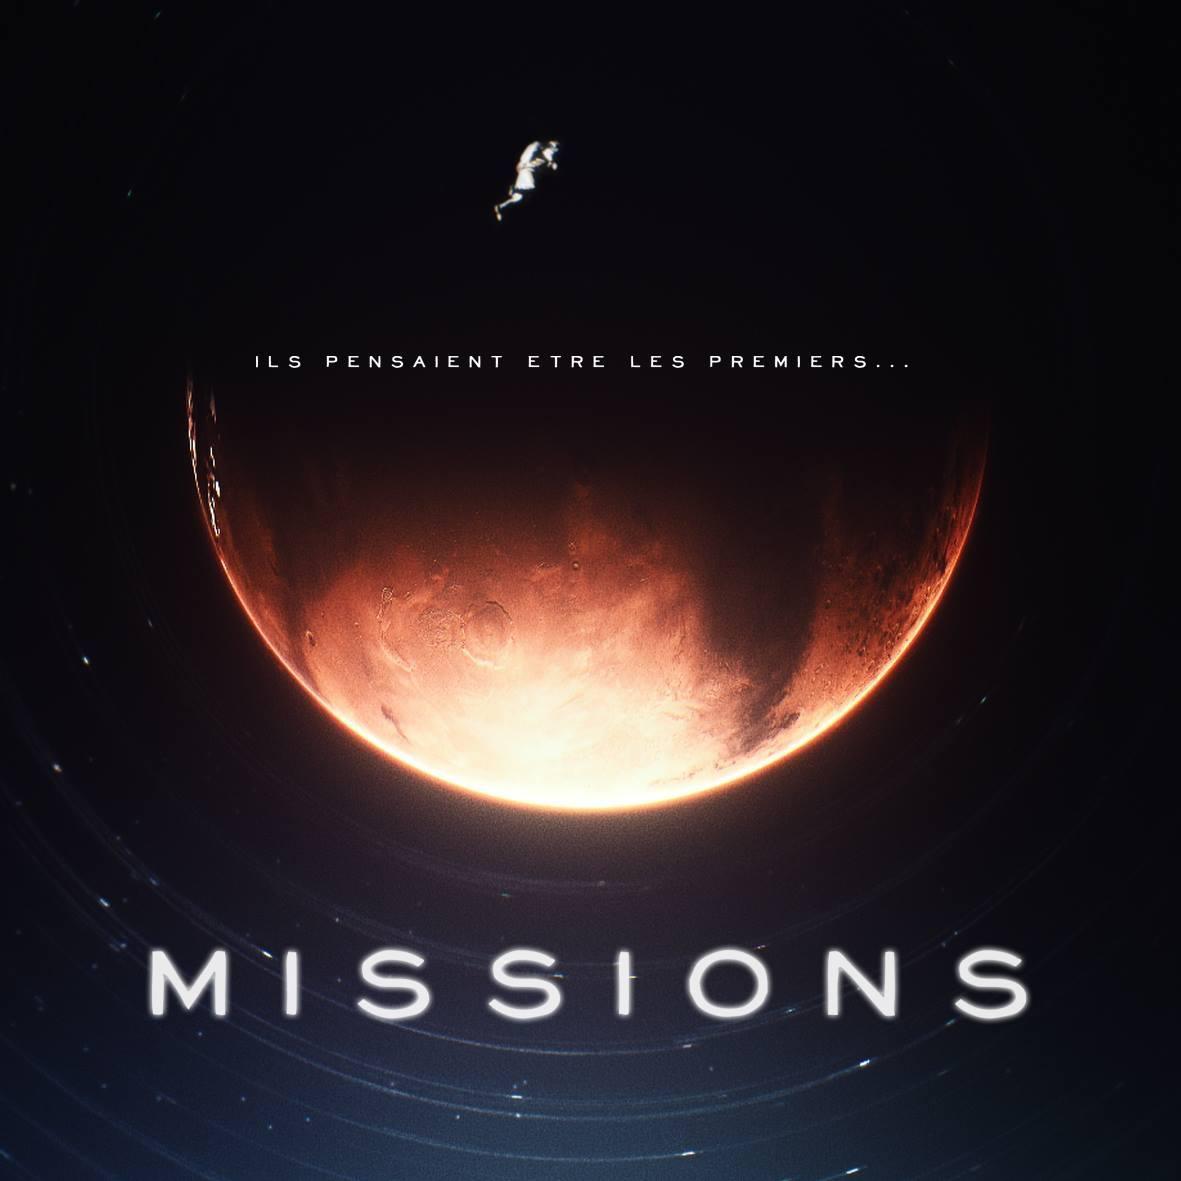 missions série ocs